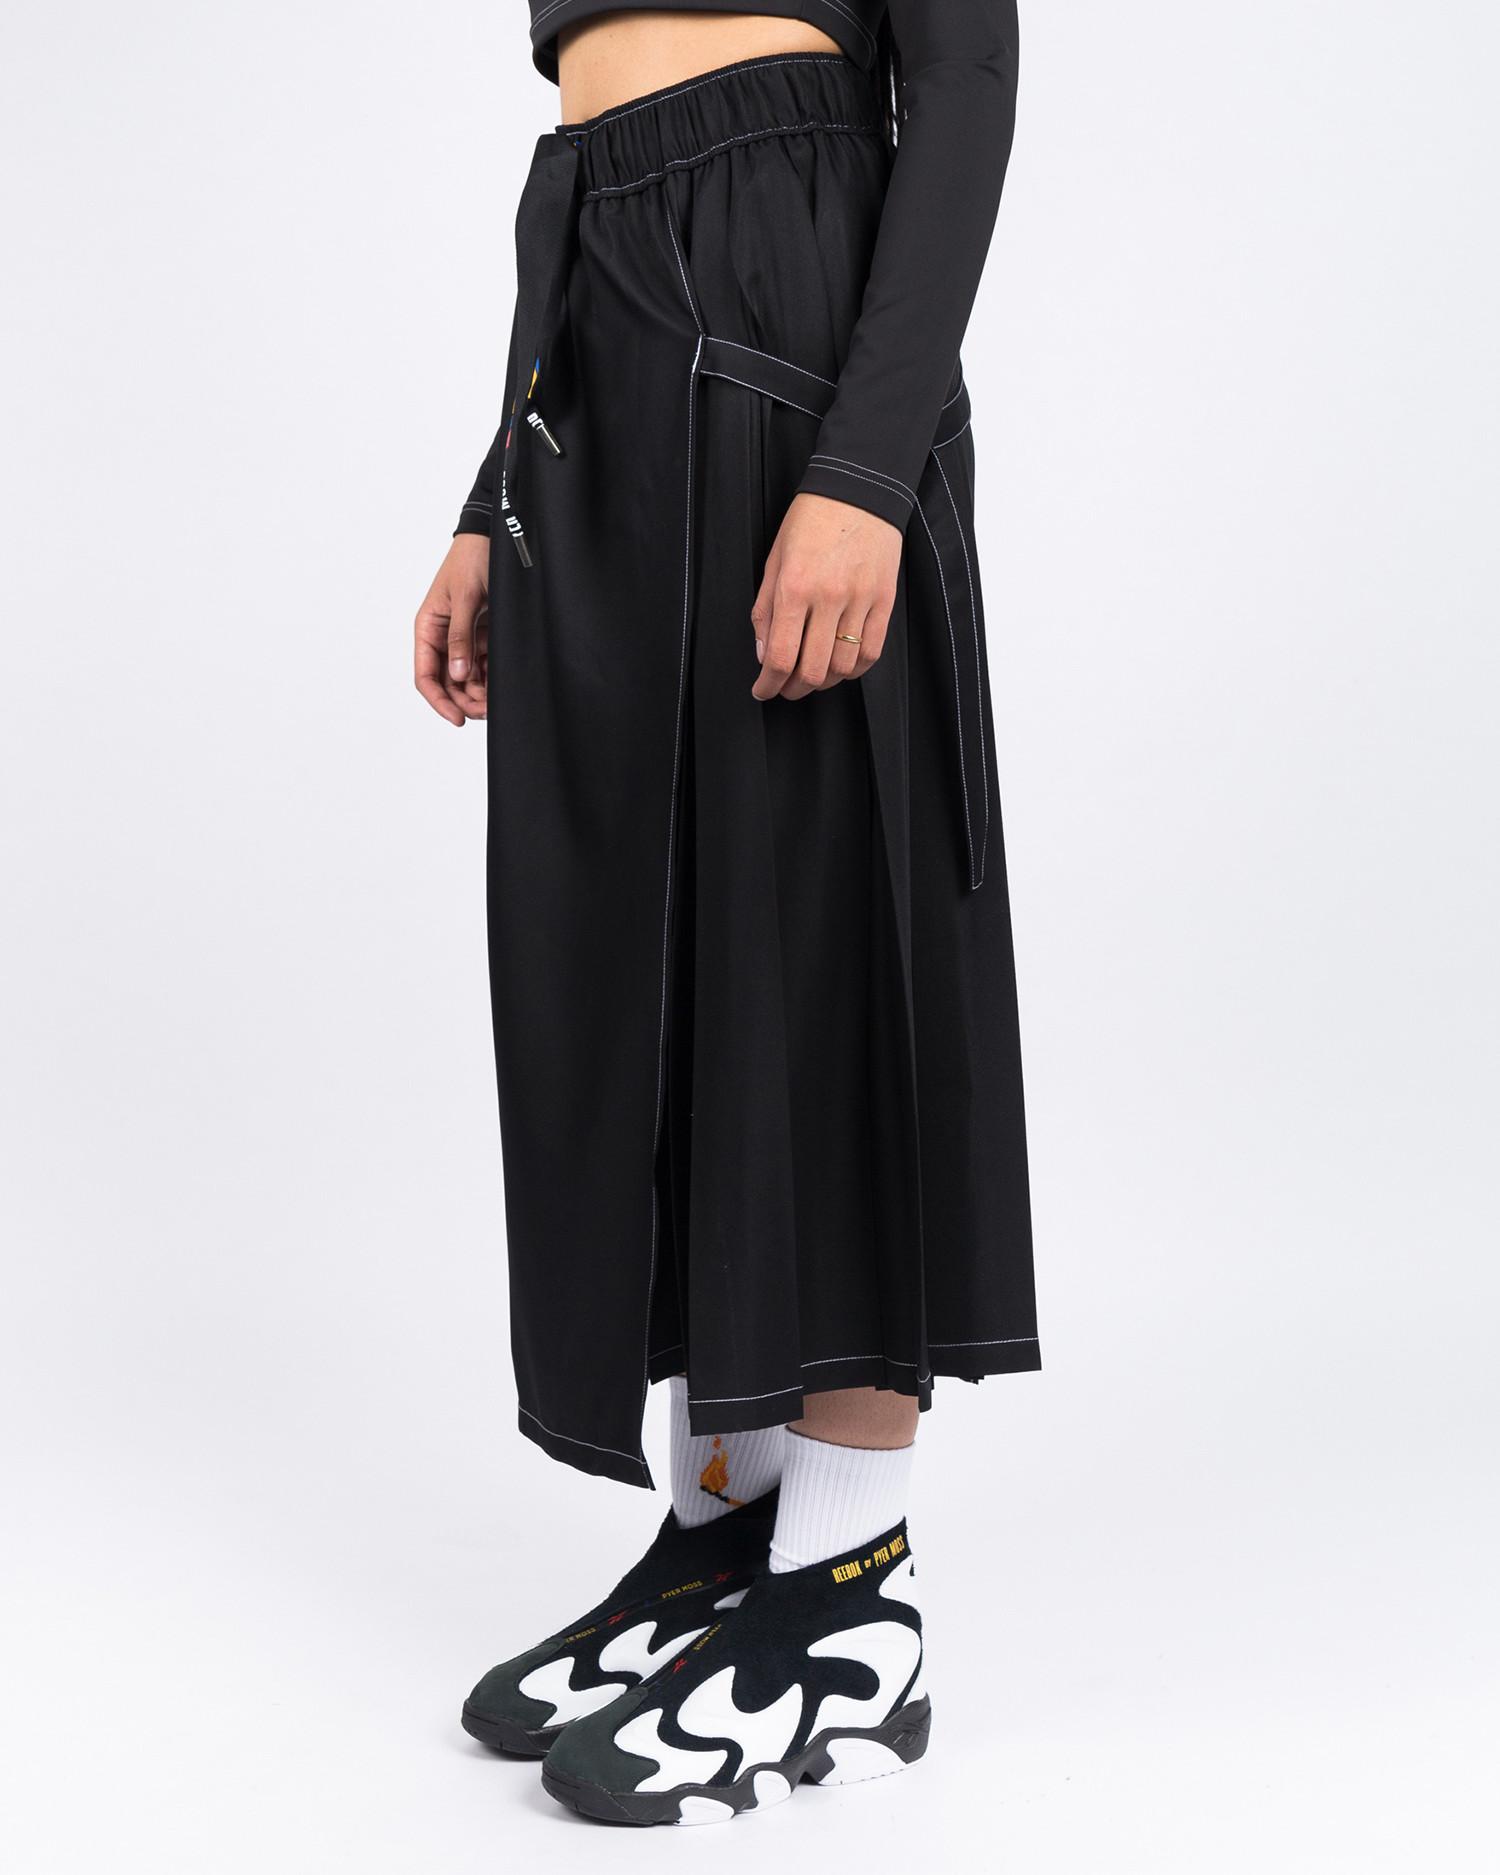 Reebok X Pyer Moss ring skirt    black